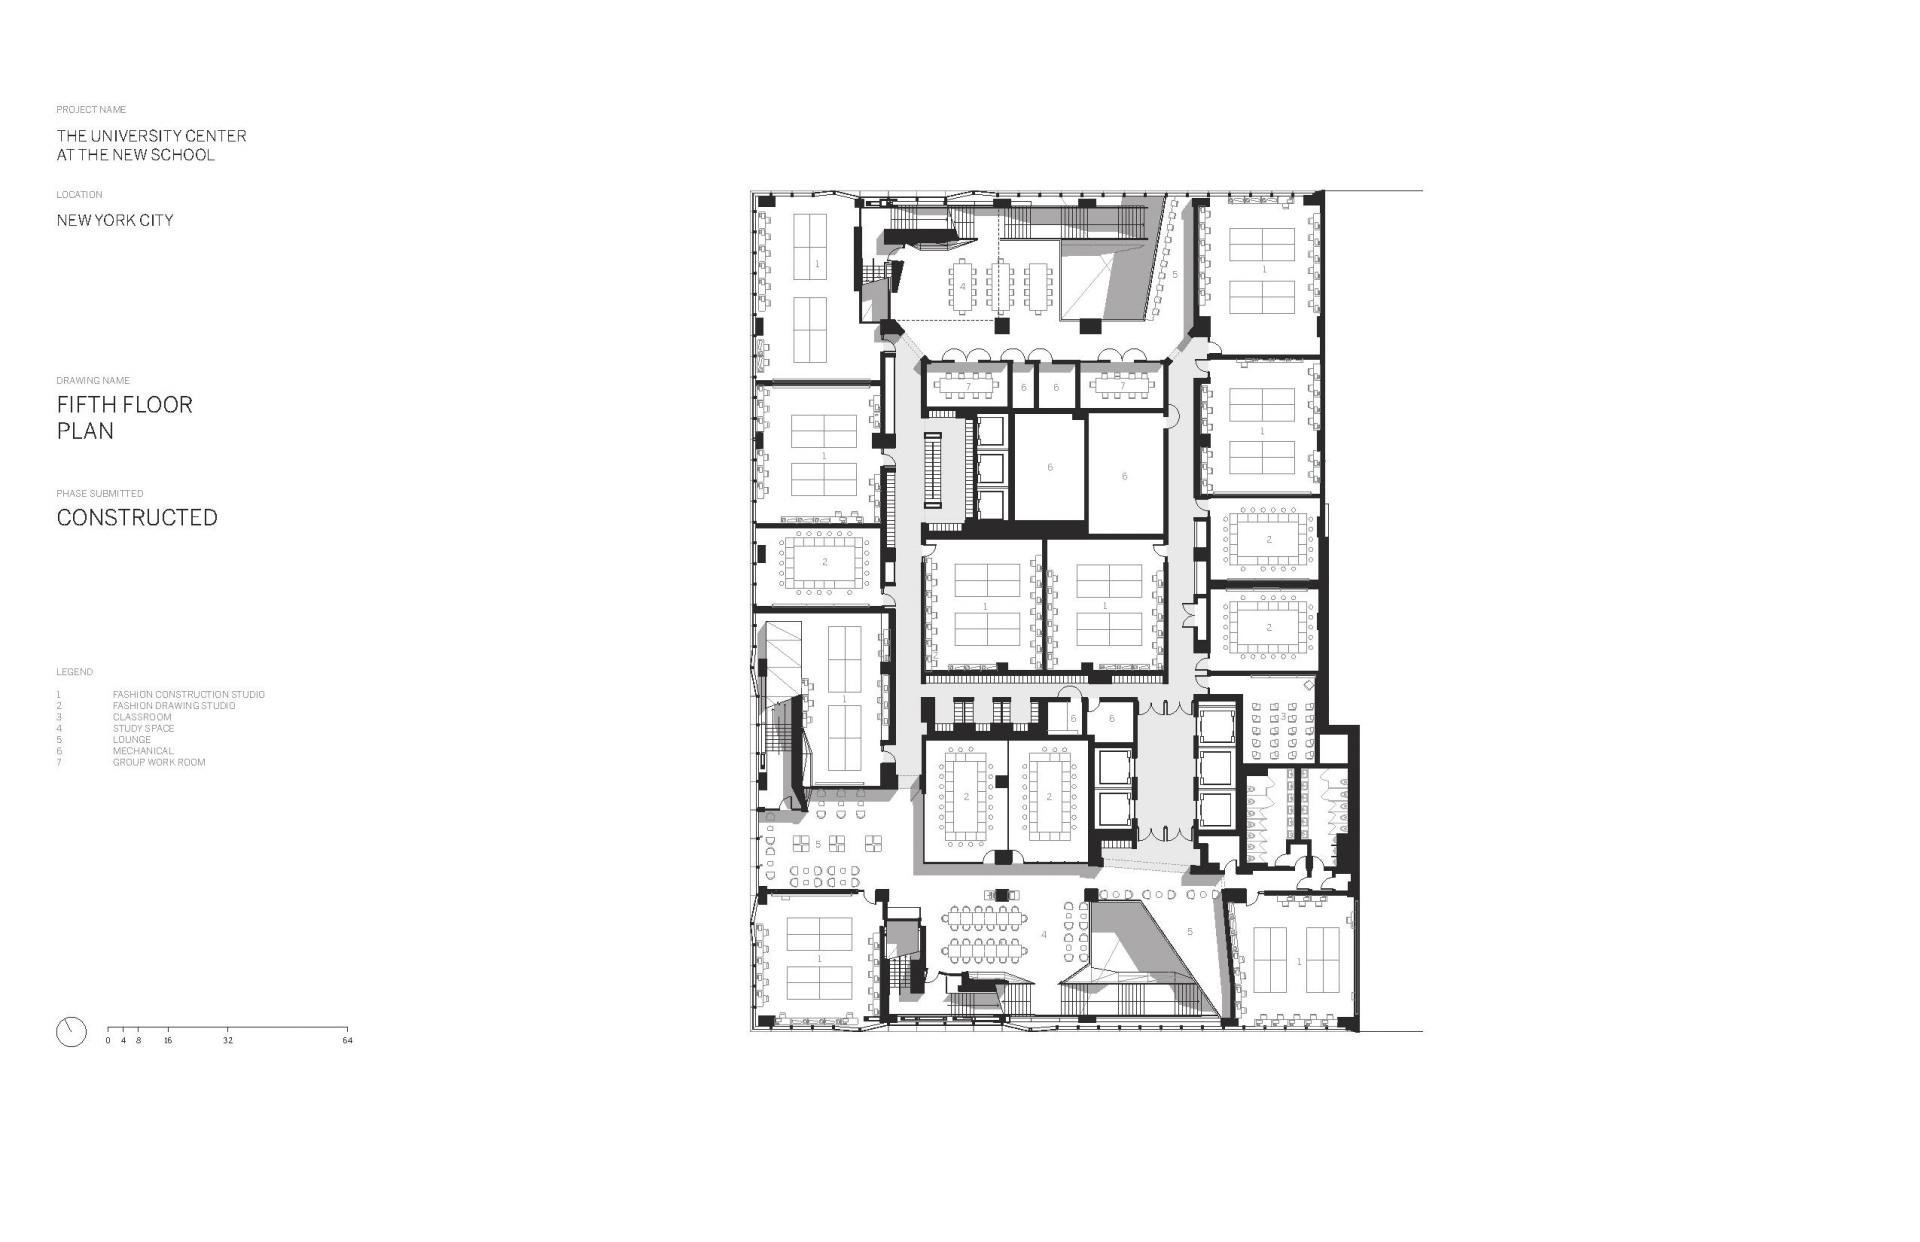 Схема учебного центра Greenwich Village в Нью Йорке - Фото 6